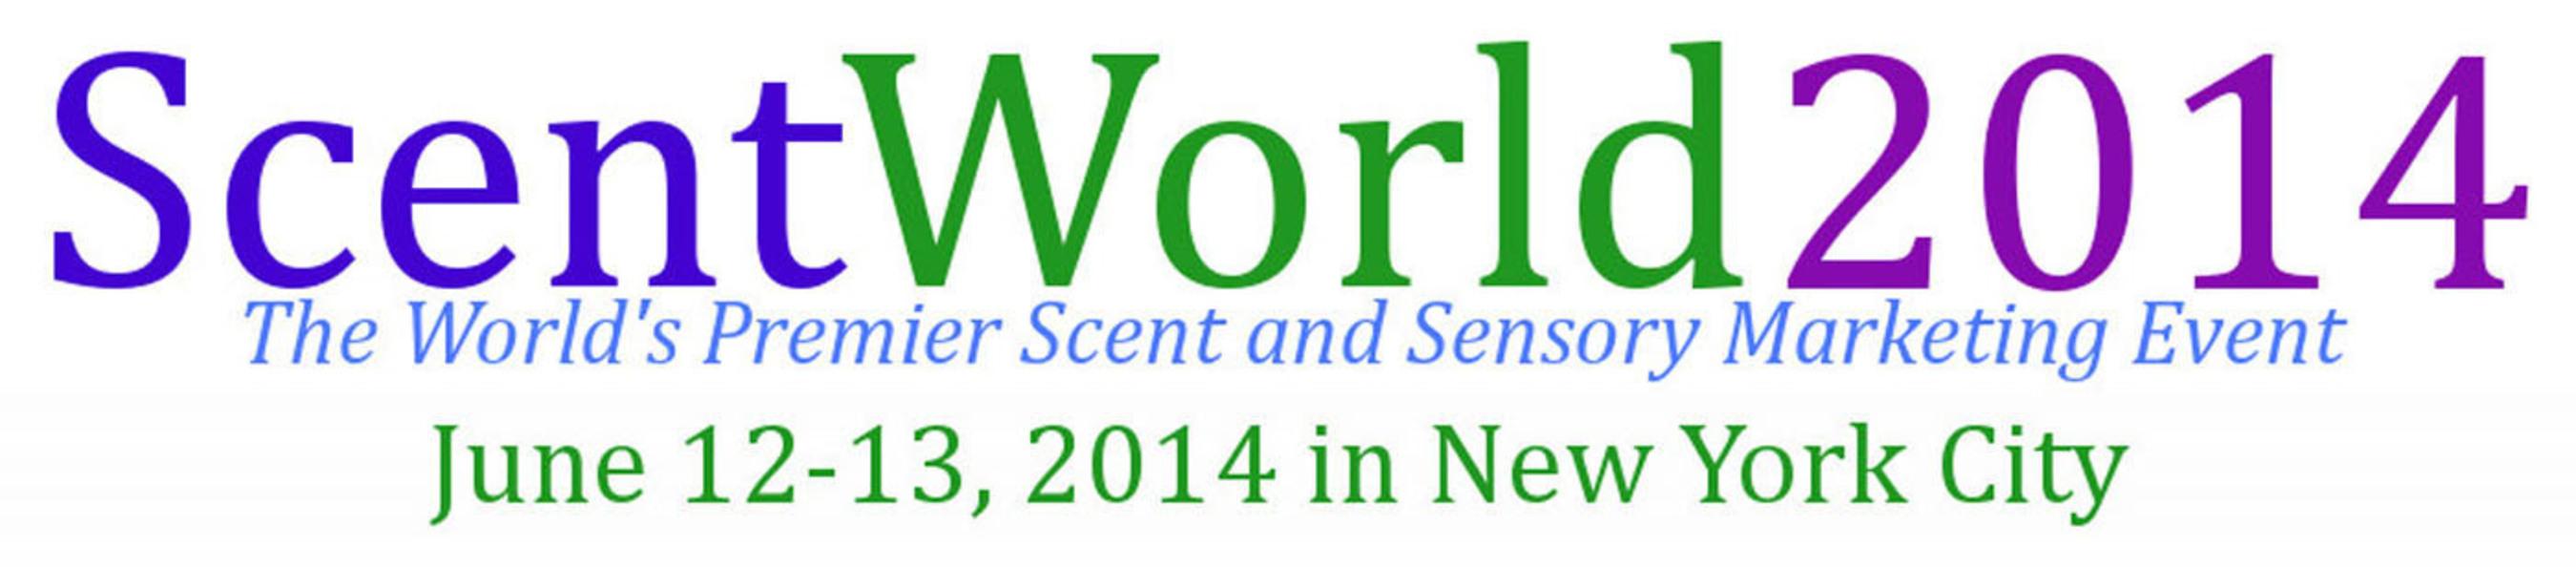 ScentWorld 2014 logo. (PRNewsFoto/Scent Marketing Institute) (PRNewsFoto/SCENT MARKETING INSTITUTE)